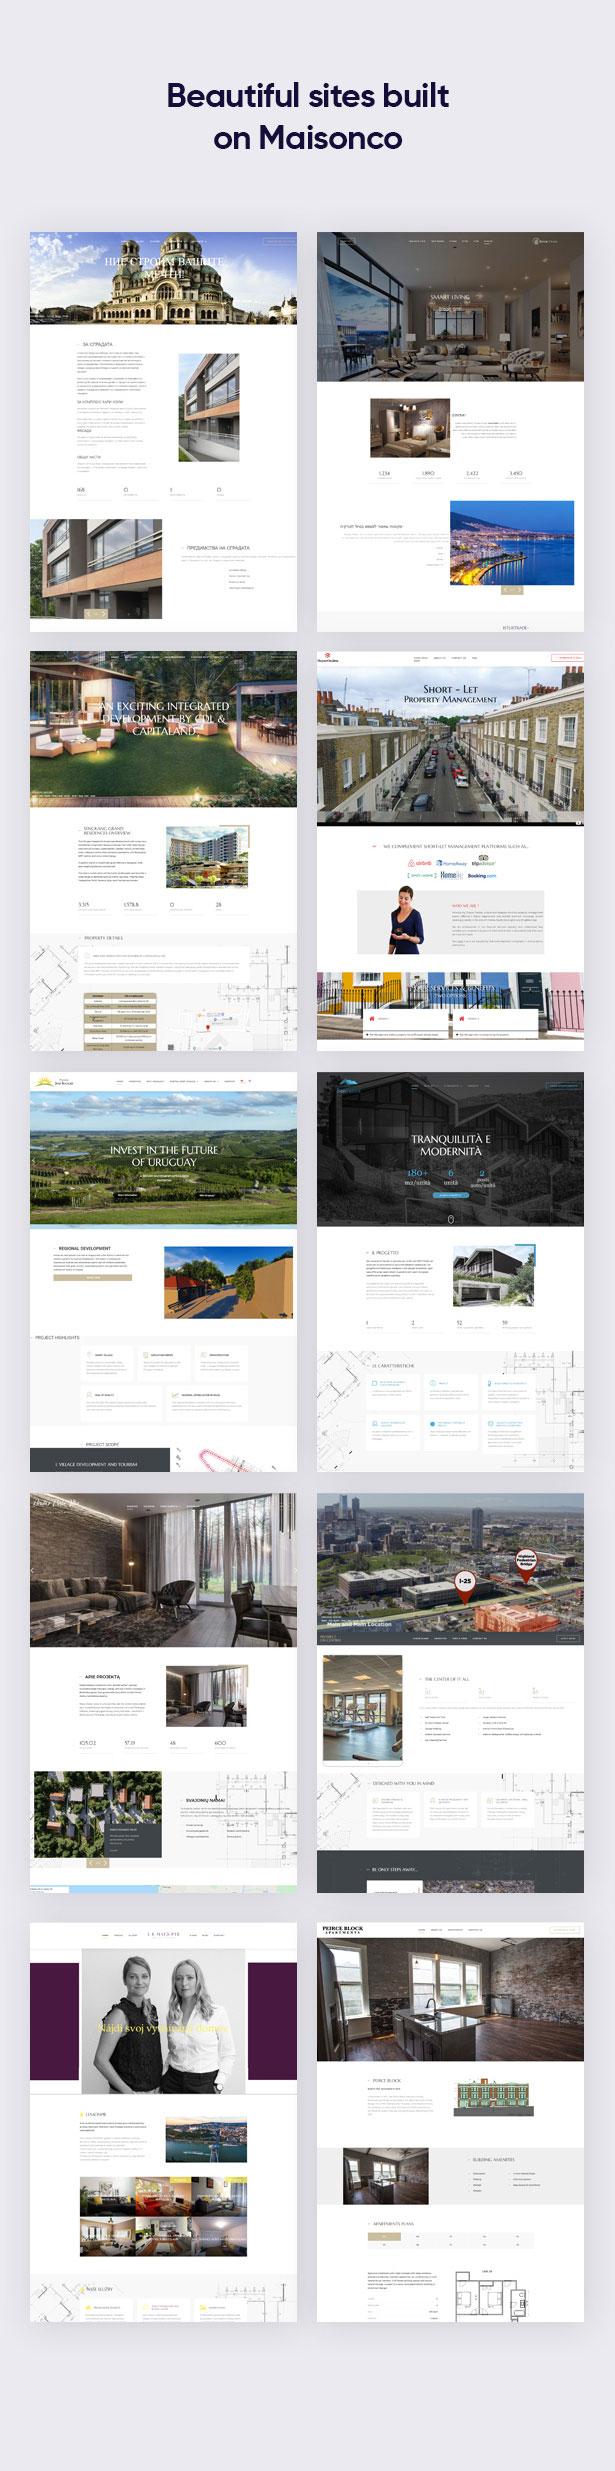 Beautiful sites built on MaisonCo Single Property For Sale & Rent WordPress Theme